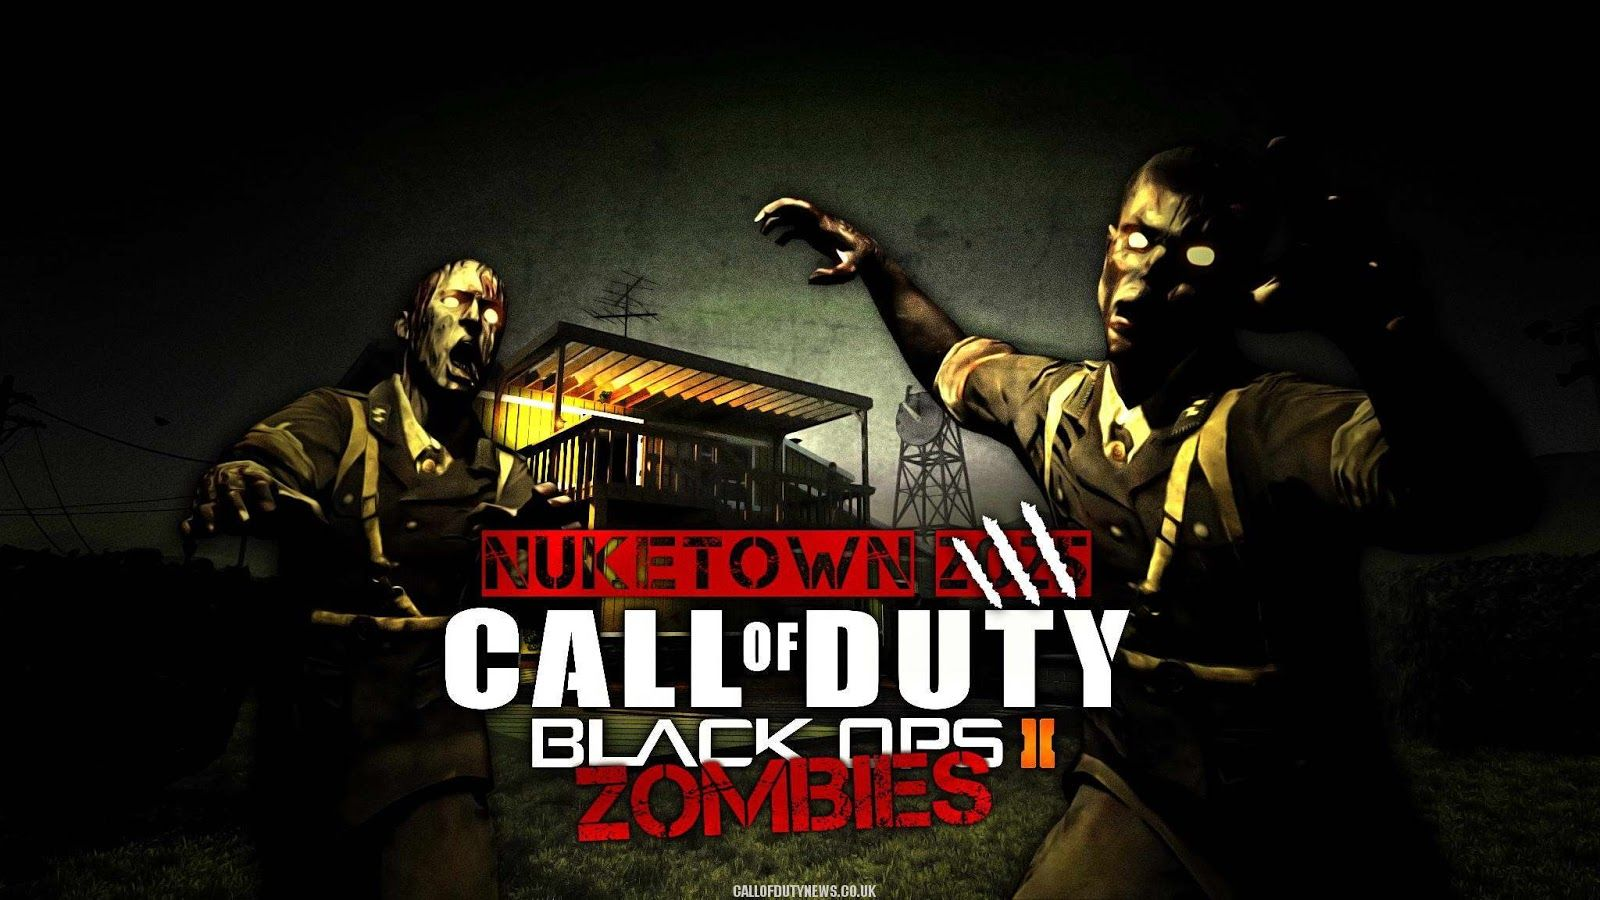 BLACK OPS | Call Of Duty: Black Ops 2 - Wallpaper #49 | COD Black Ops 2